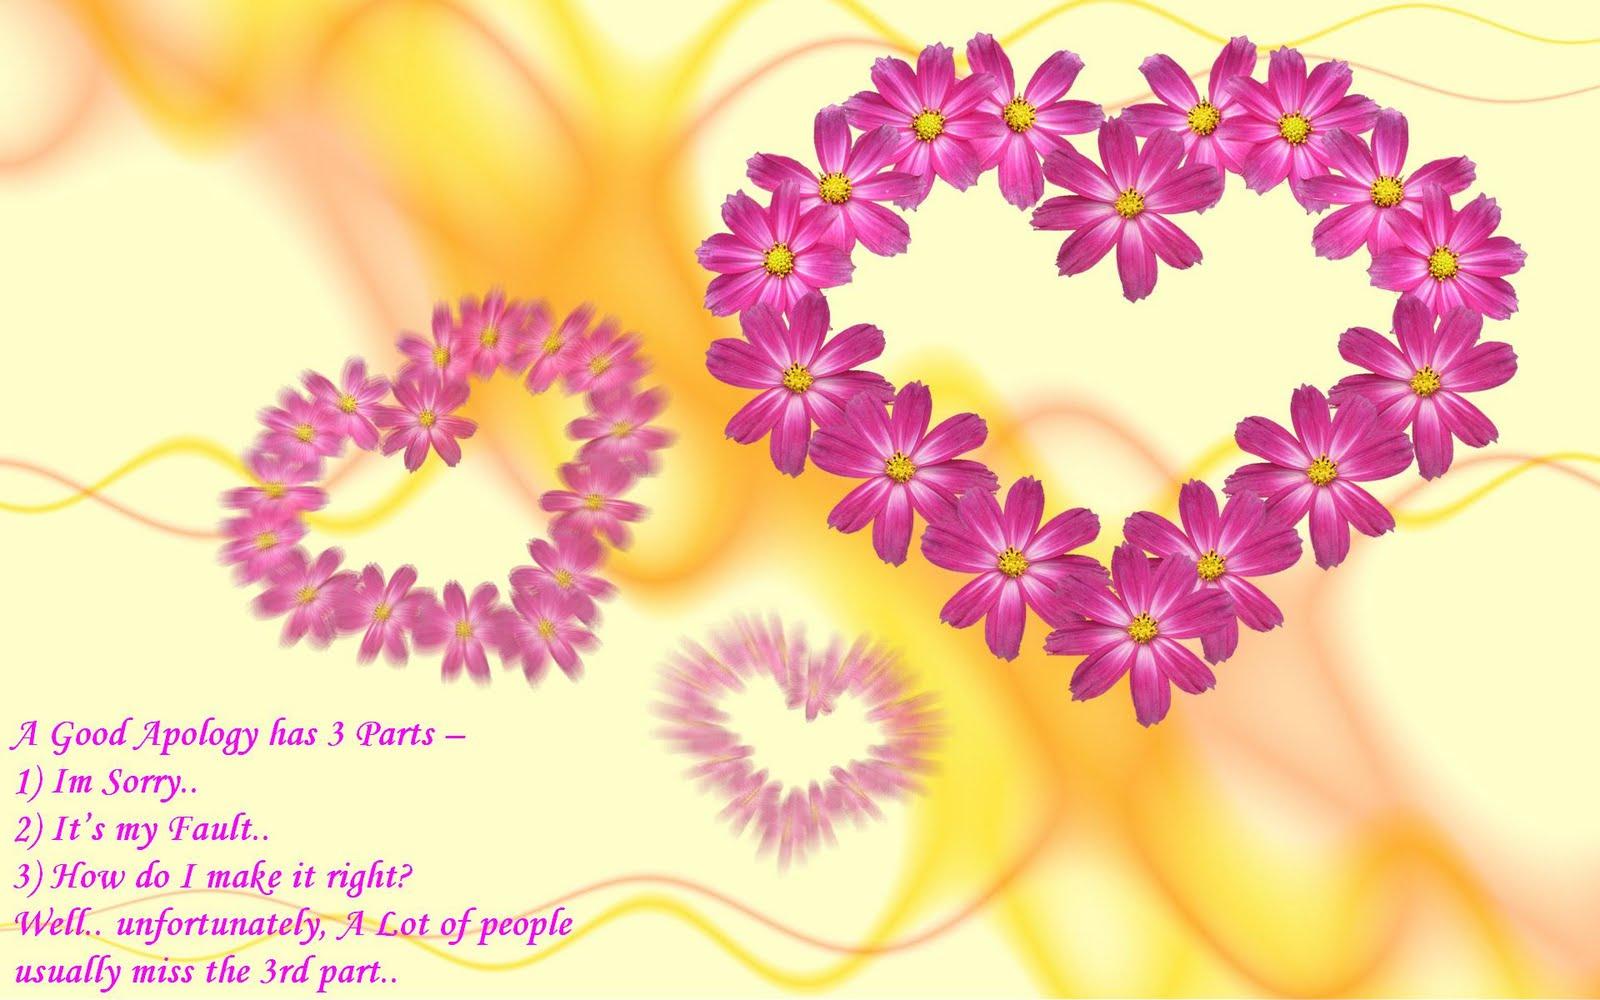 http://1.bp.blogspot.com/_tg42ArcfTzU/TGlO7SrwD9I/AAAAAAAABF0/CYFc2PRLc9k/s1600/Love+Wallpaper.JPG